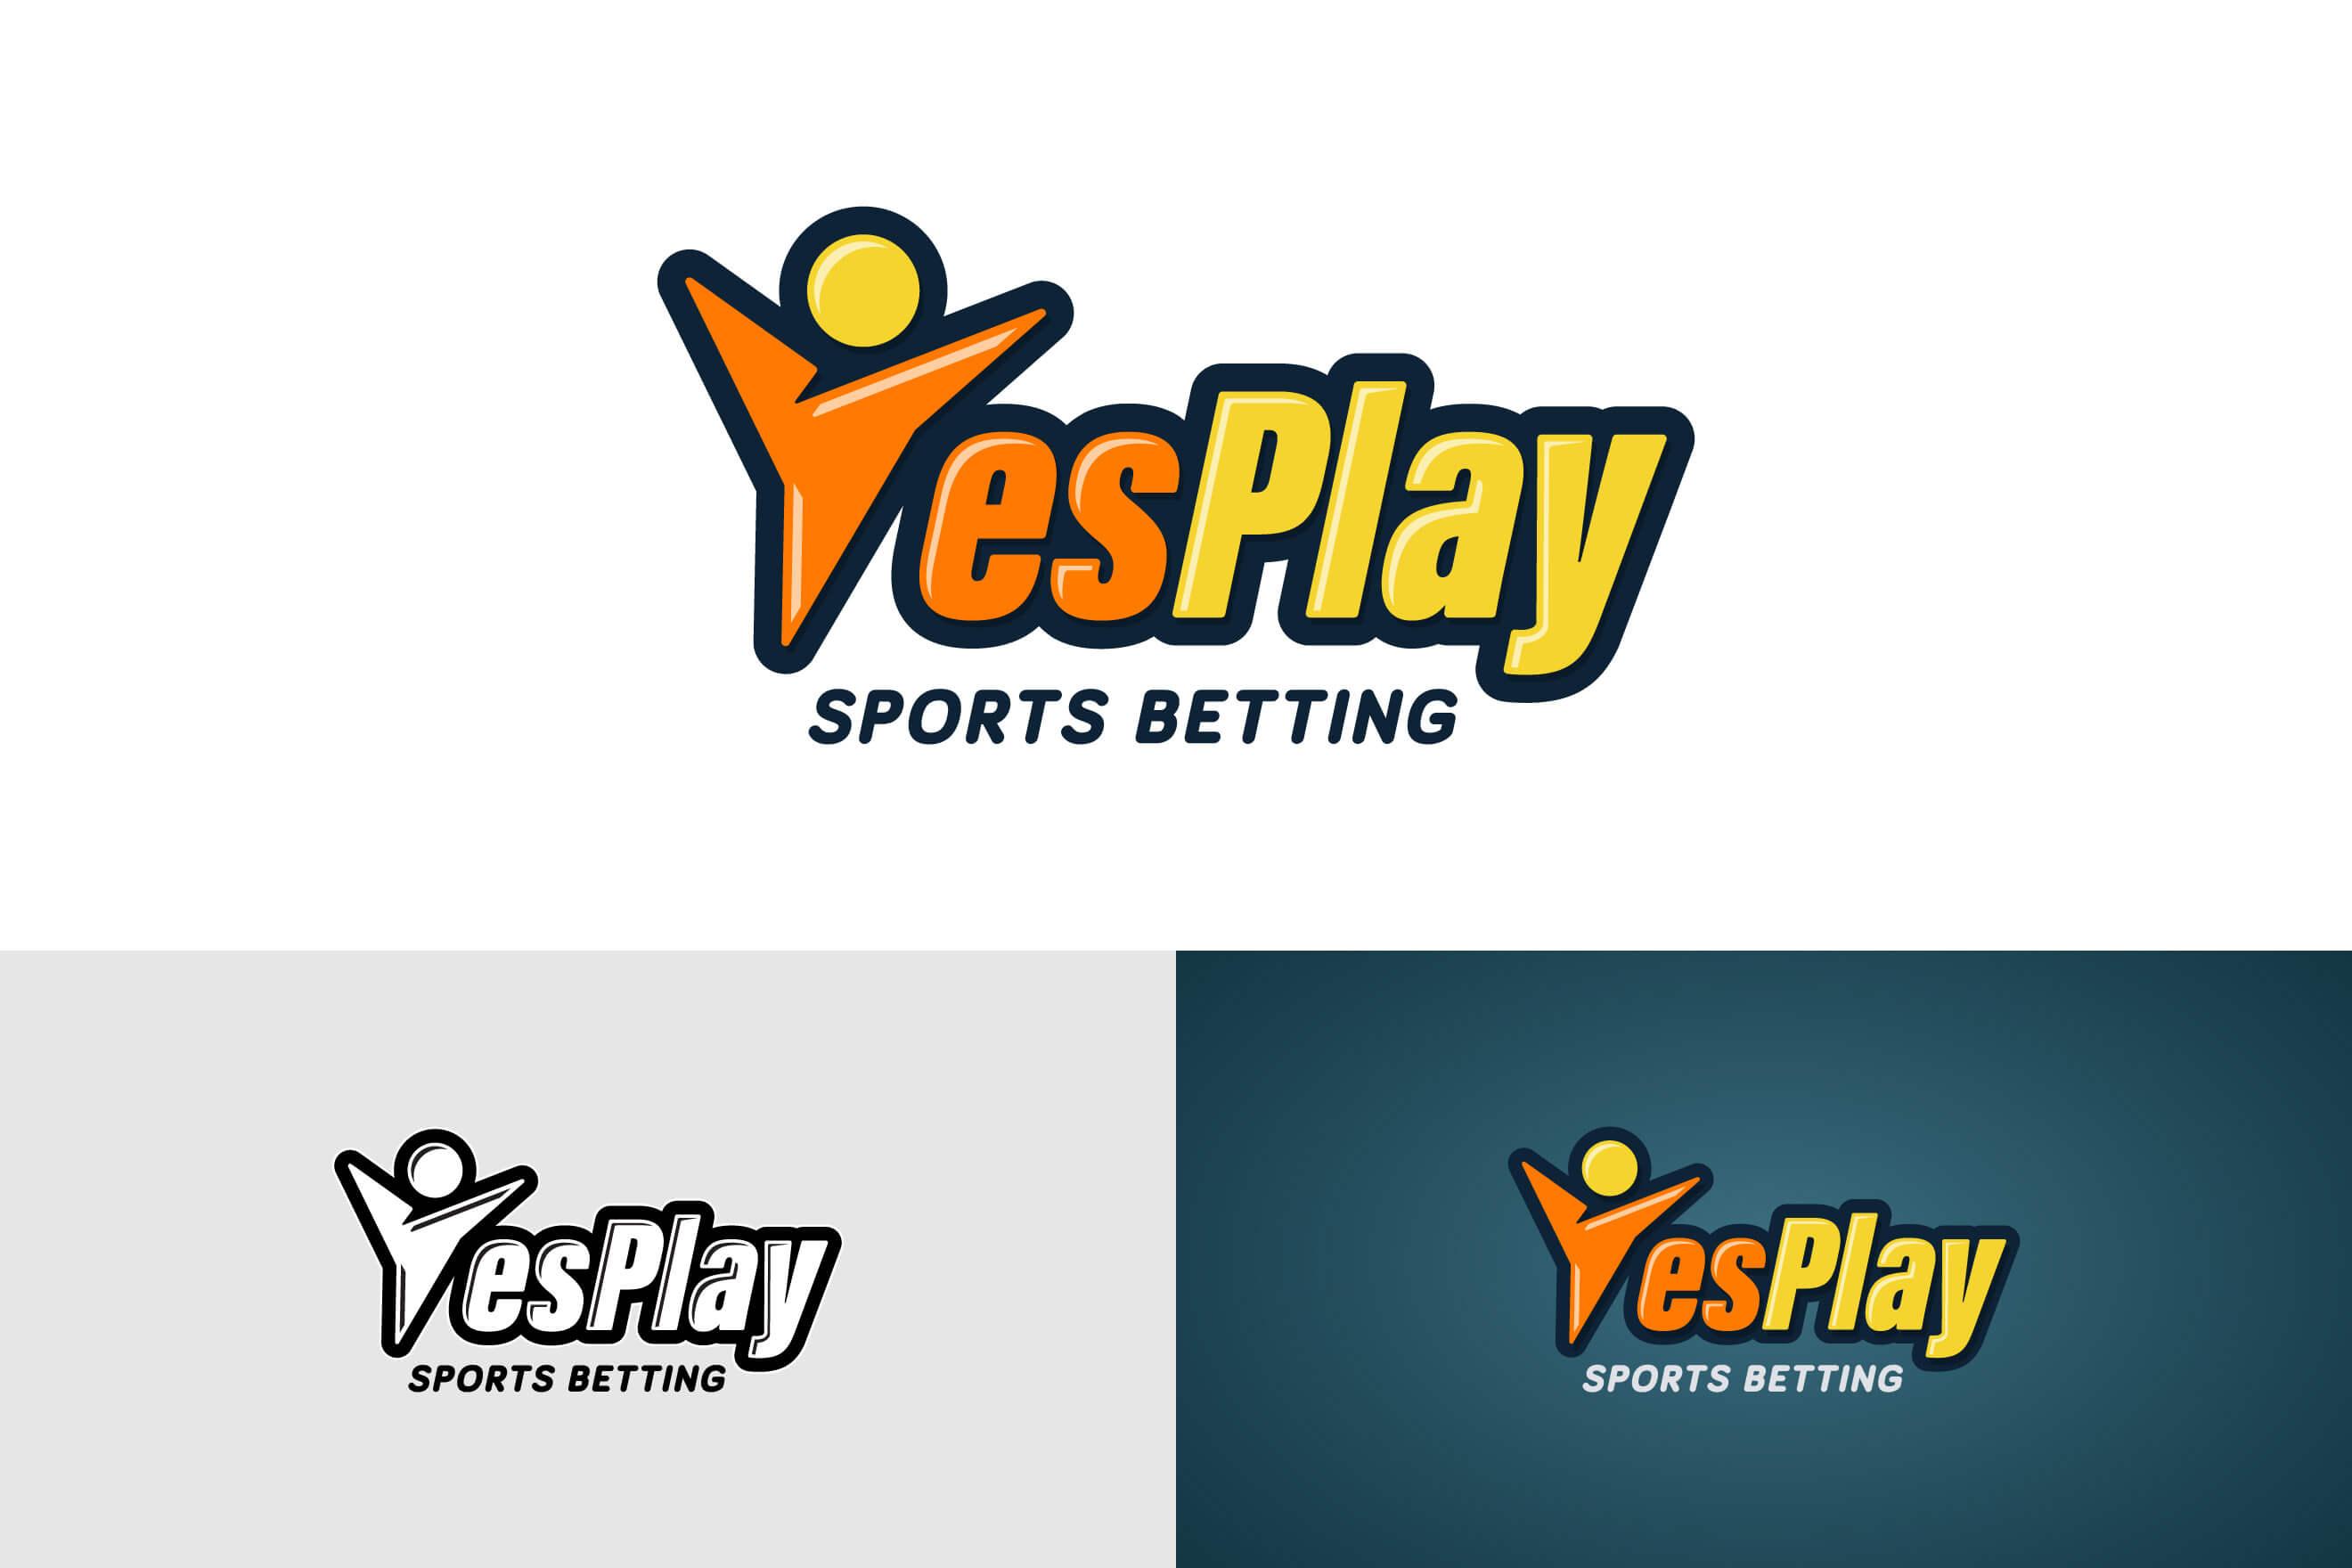 logo design for YesPlay Sports Betting